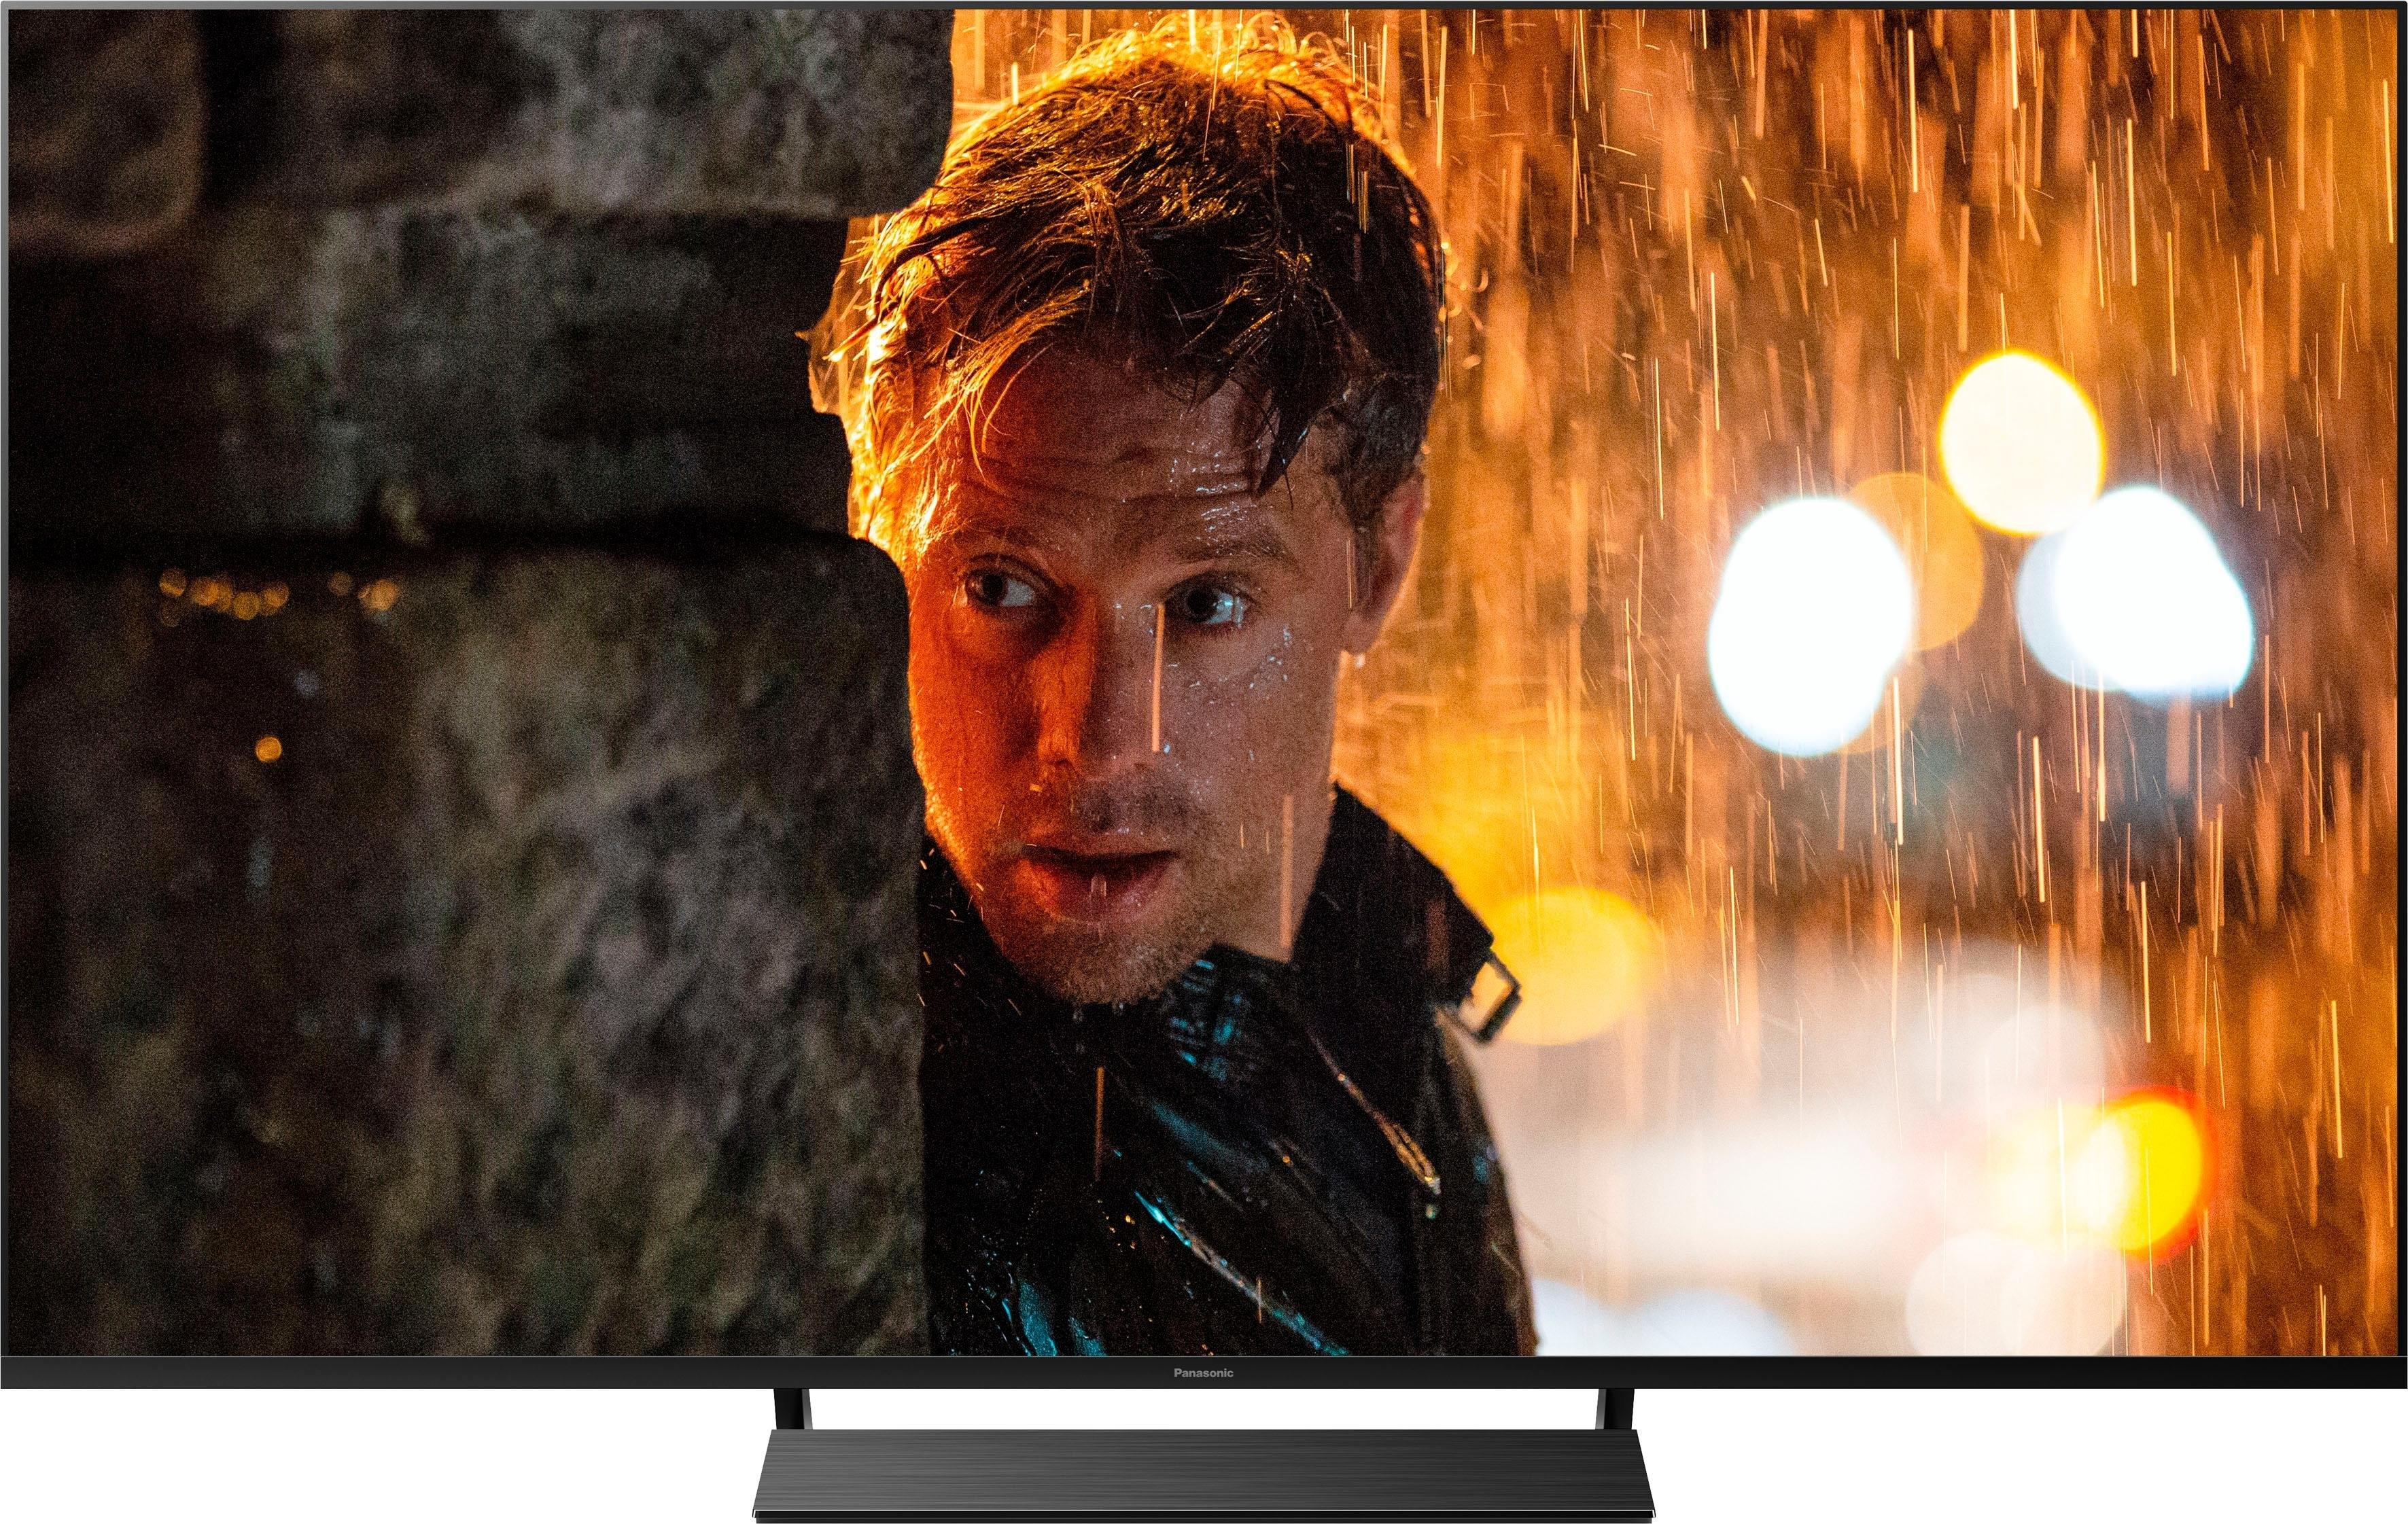 Panasonic TX-50GXW804 lcd-led-tv (126 cm / 50 inch), 4K Ultra HD, Smart-TV - verschillende betaalmethodes